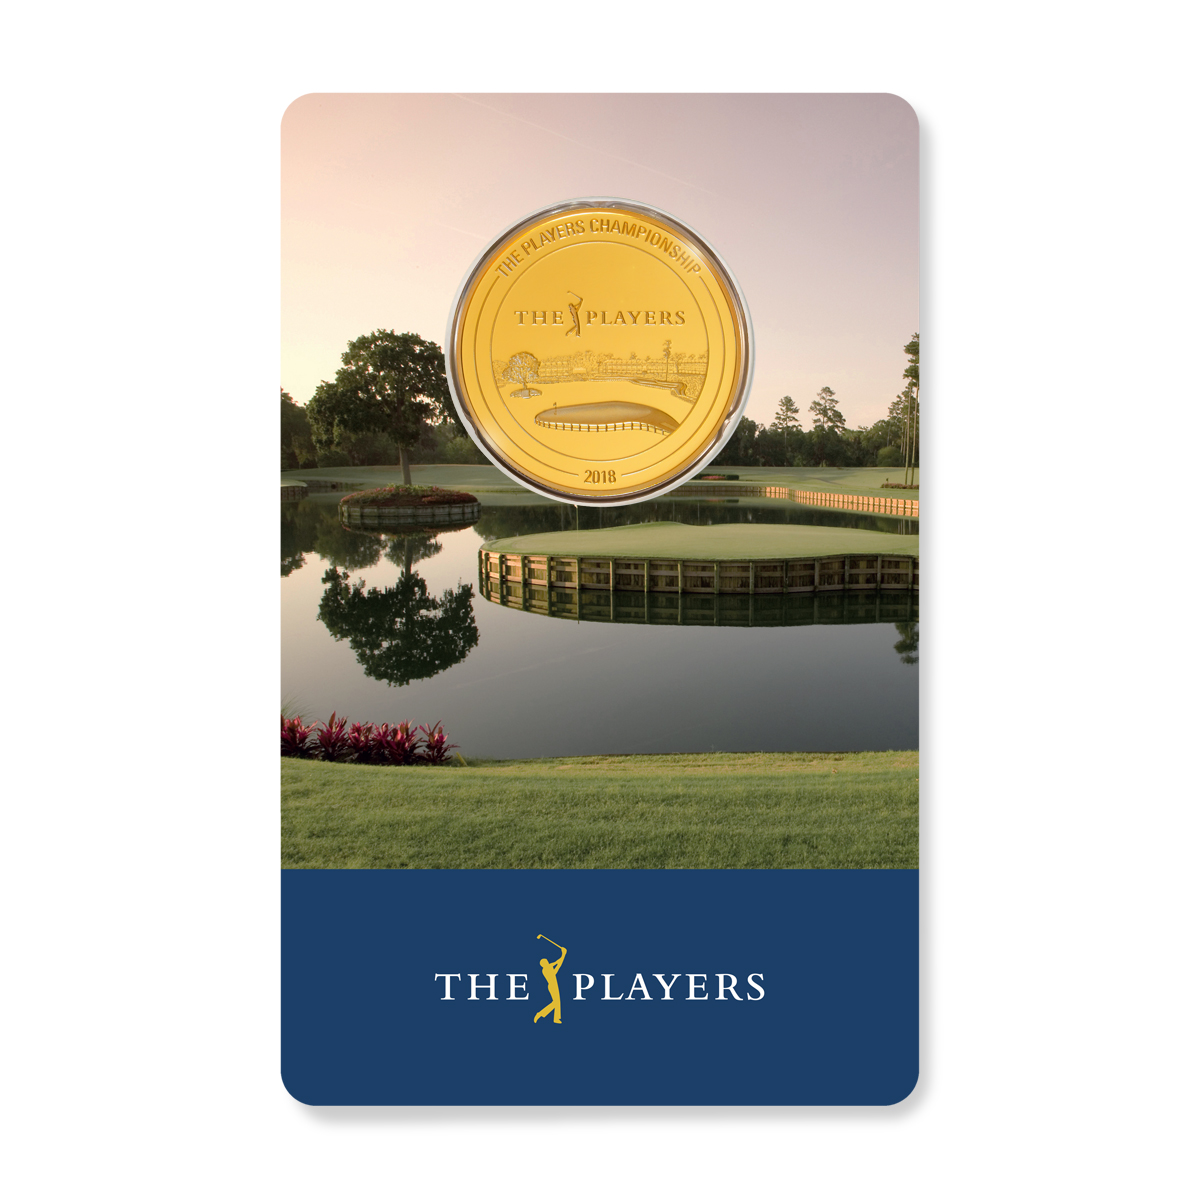 1/4 Unze Goldmünze PGA TOUR® THE PLAYERS Championship 2018 PP (Box, Zertifikat)